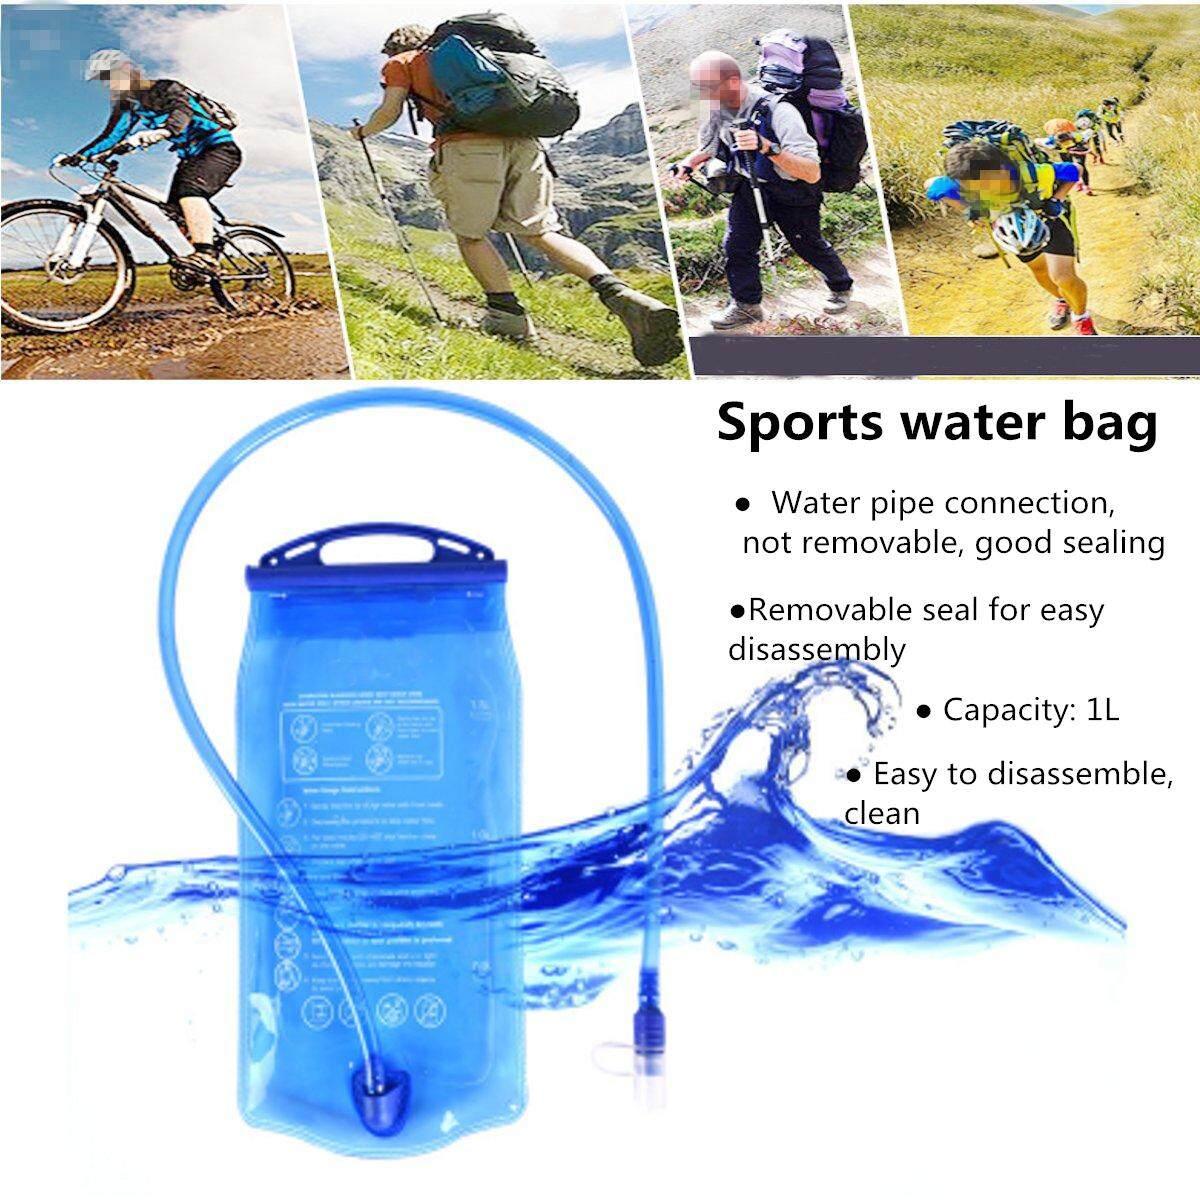 ed6b1e5b2a1 Bicycle Mouth Water Bladder Bag Hydration Packs Camping Hiking Climbing  Cycling